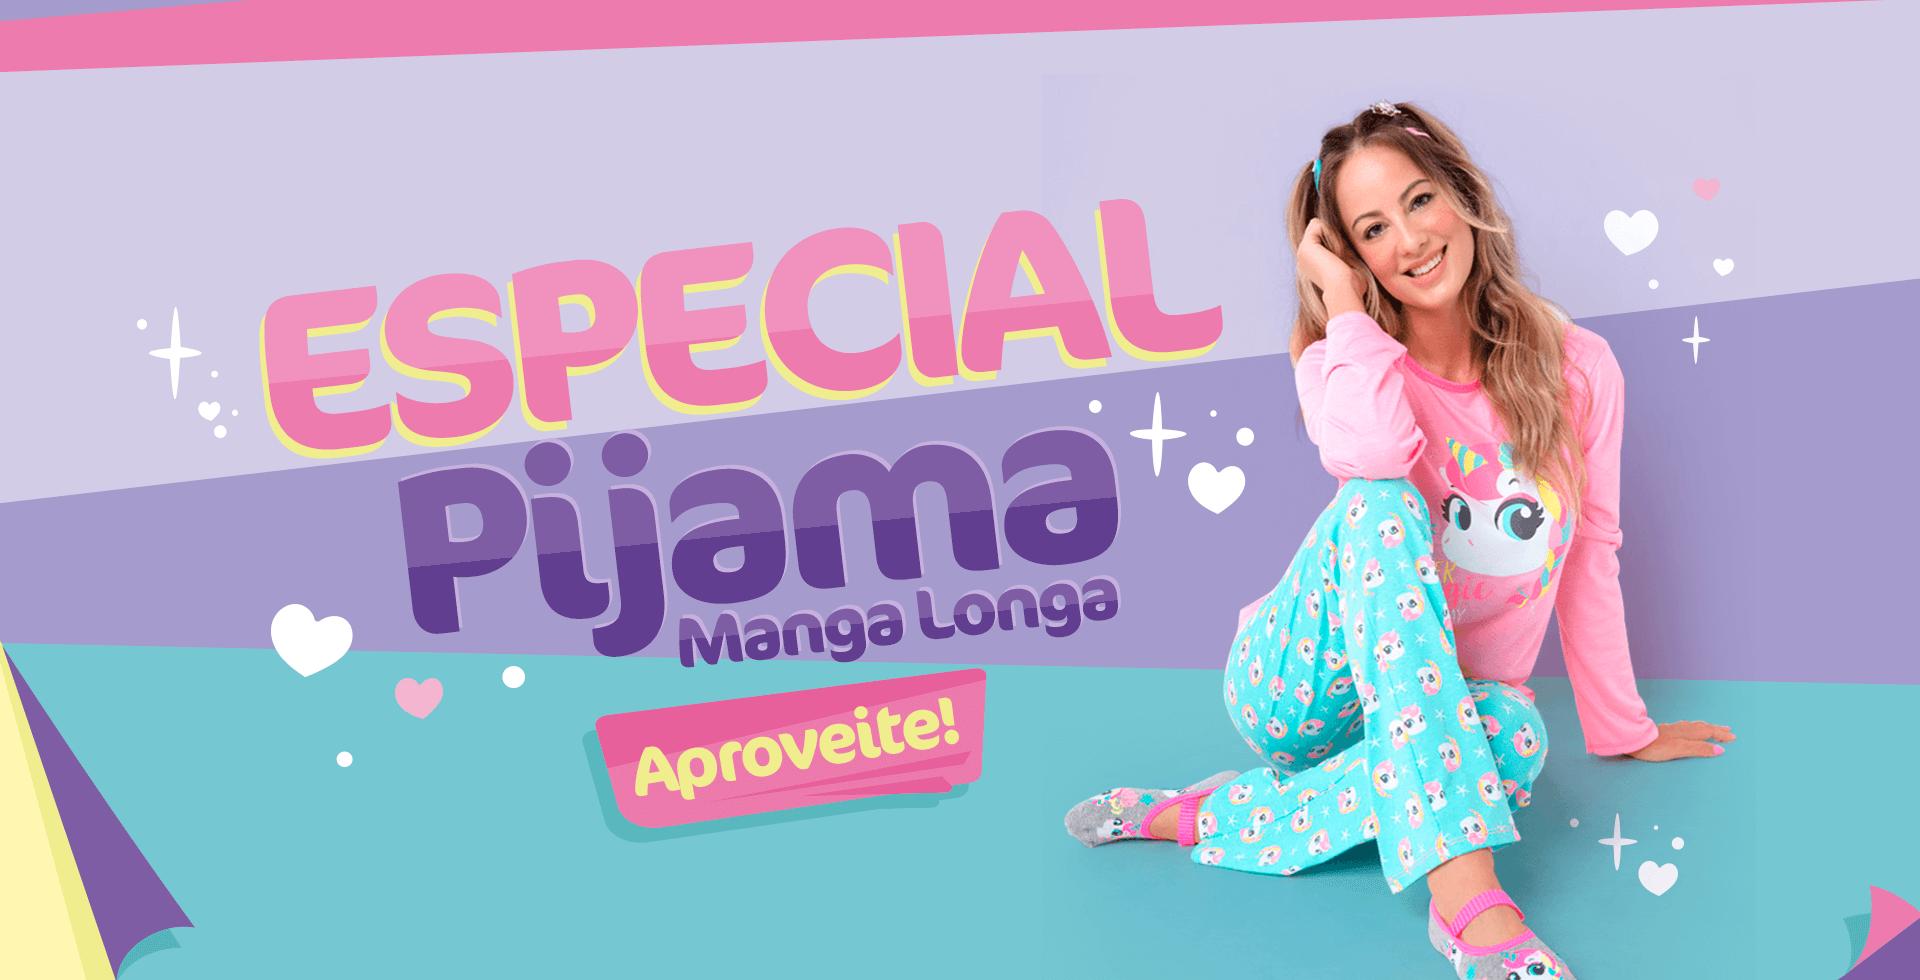 Especial Pijama Manga Longa!